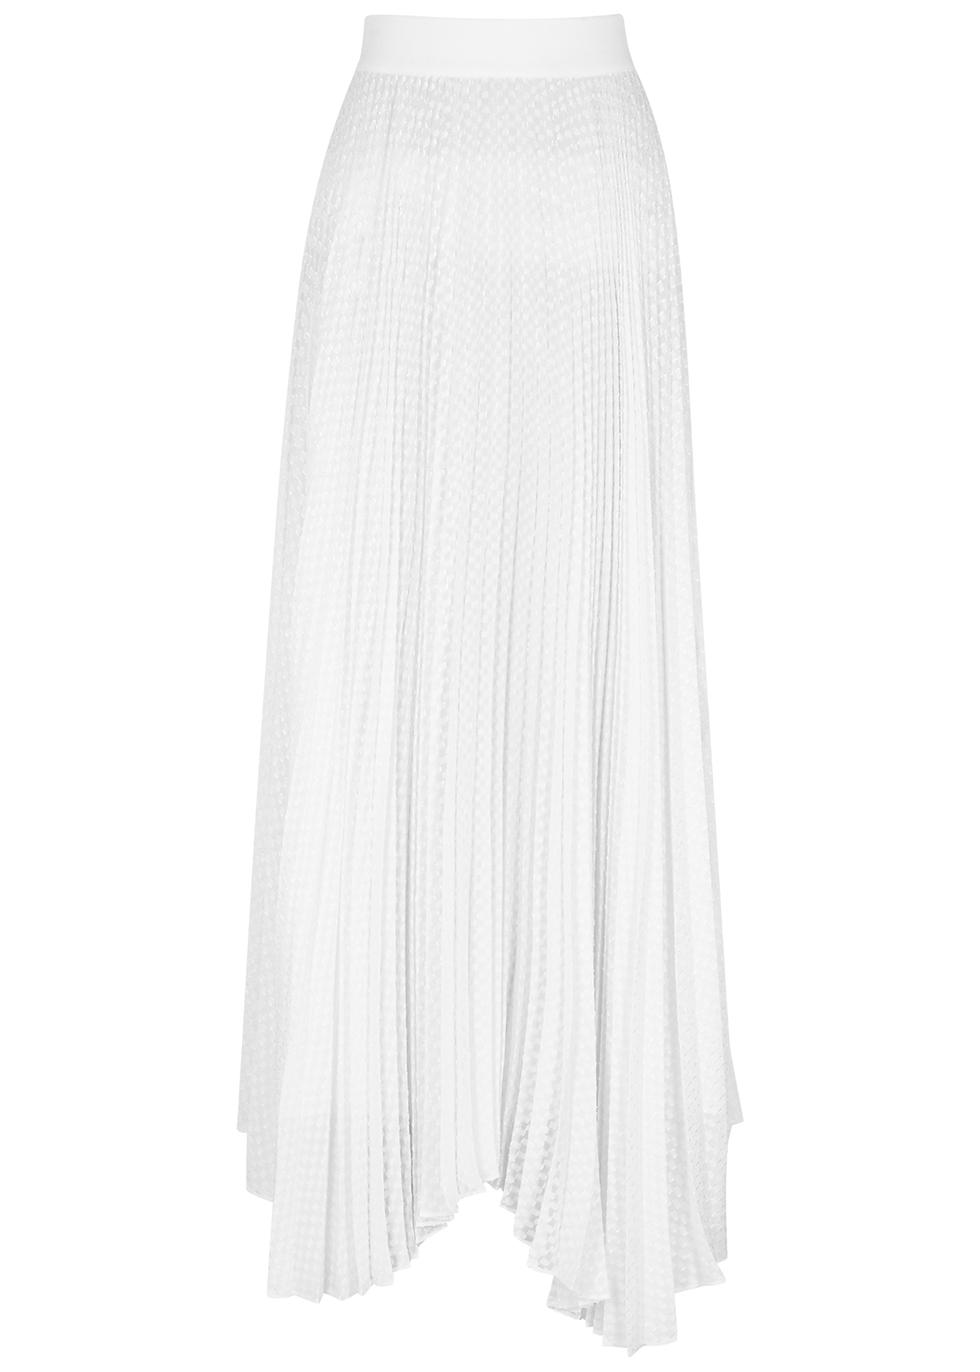 Katz white pleated jacquard maxi skirt